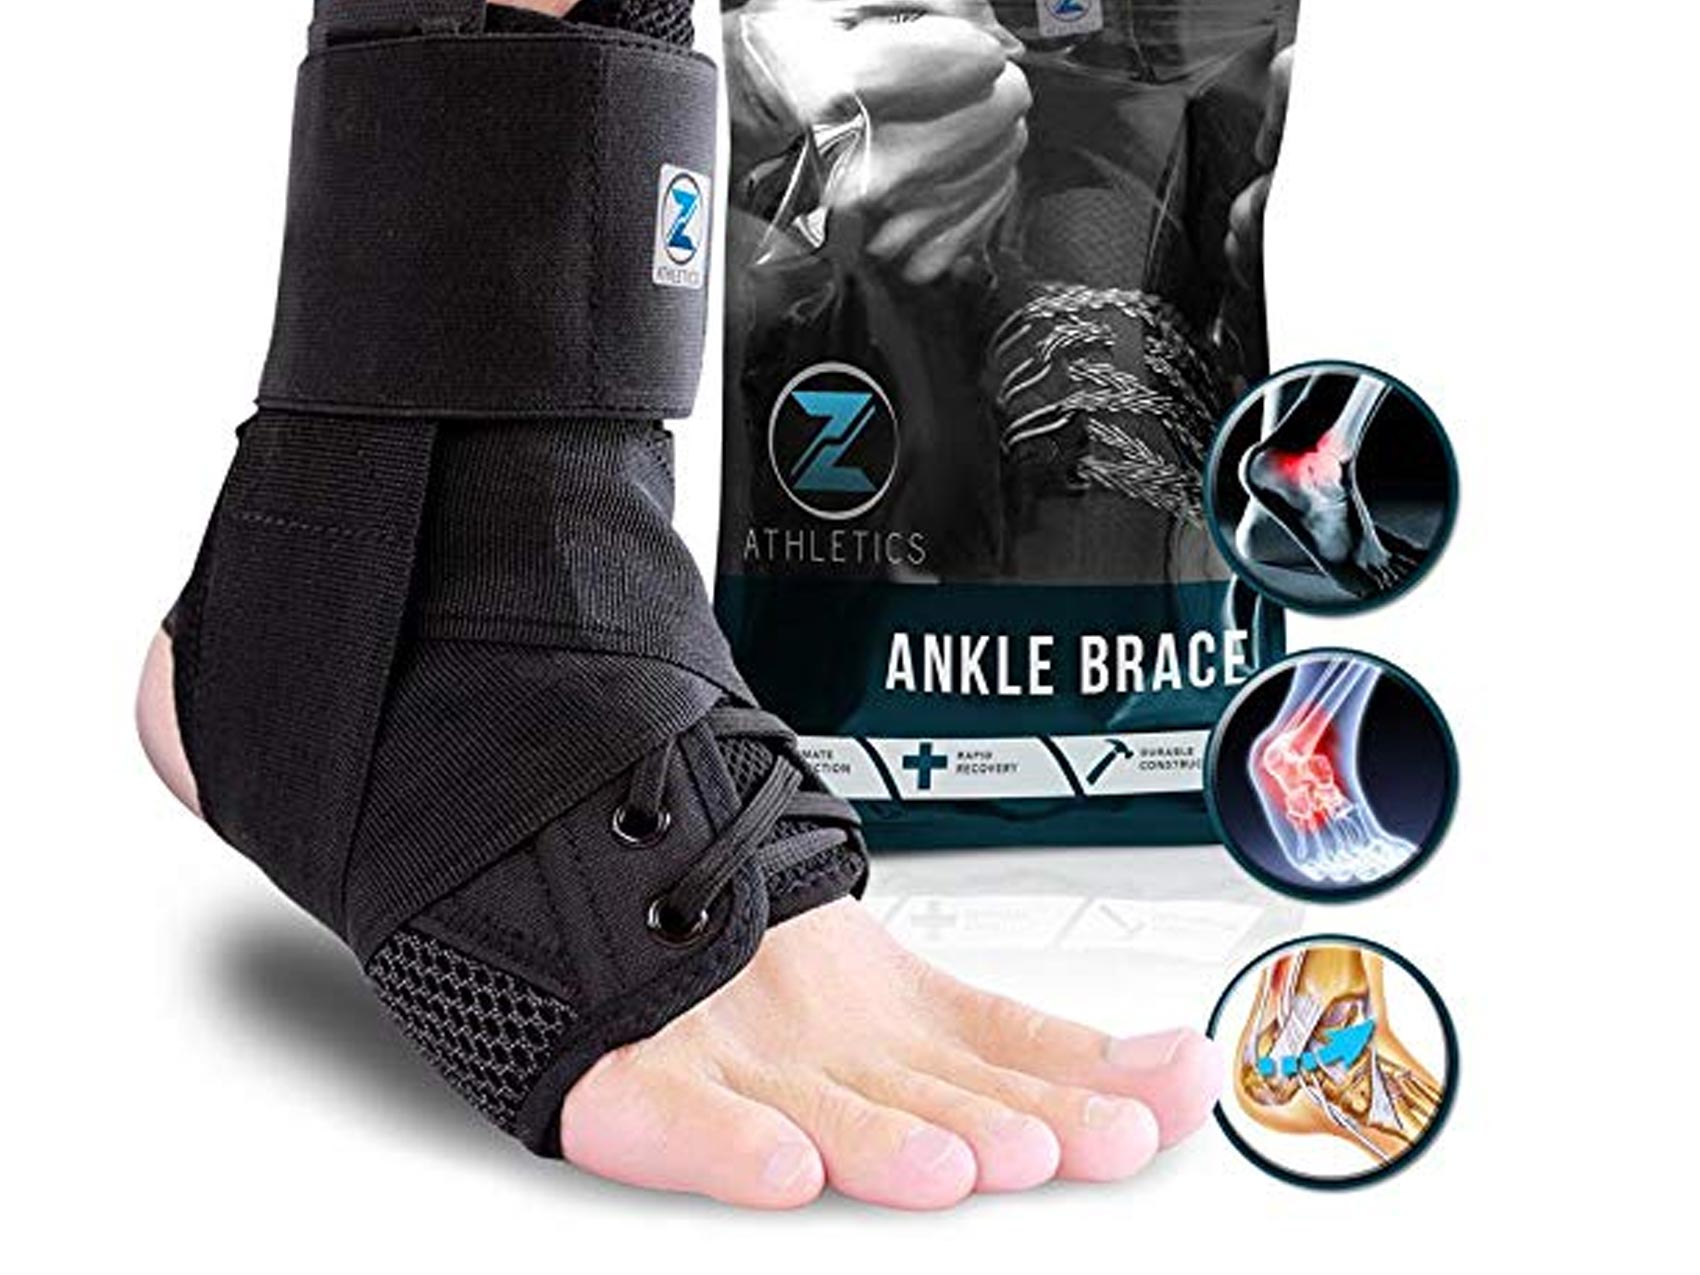 Zenith Athletics ankle brace